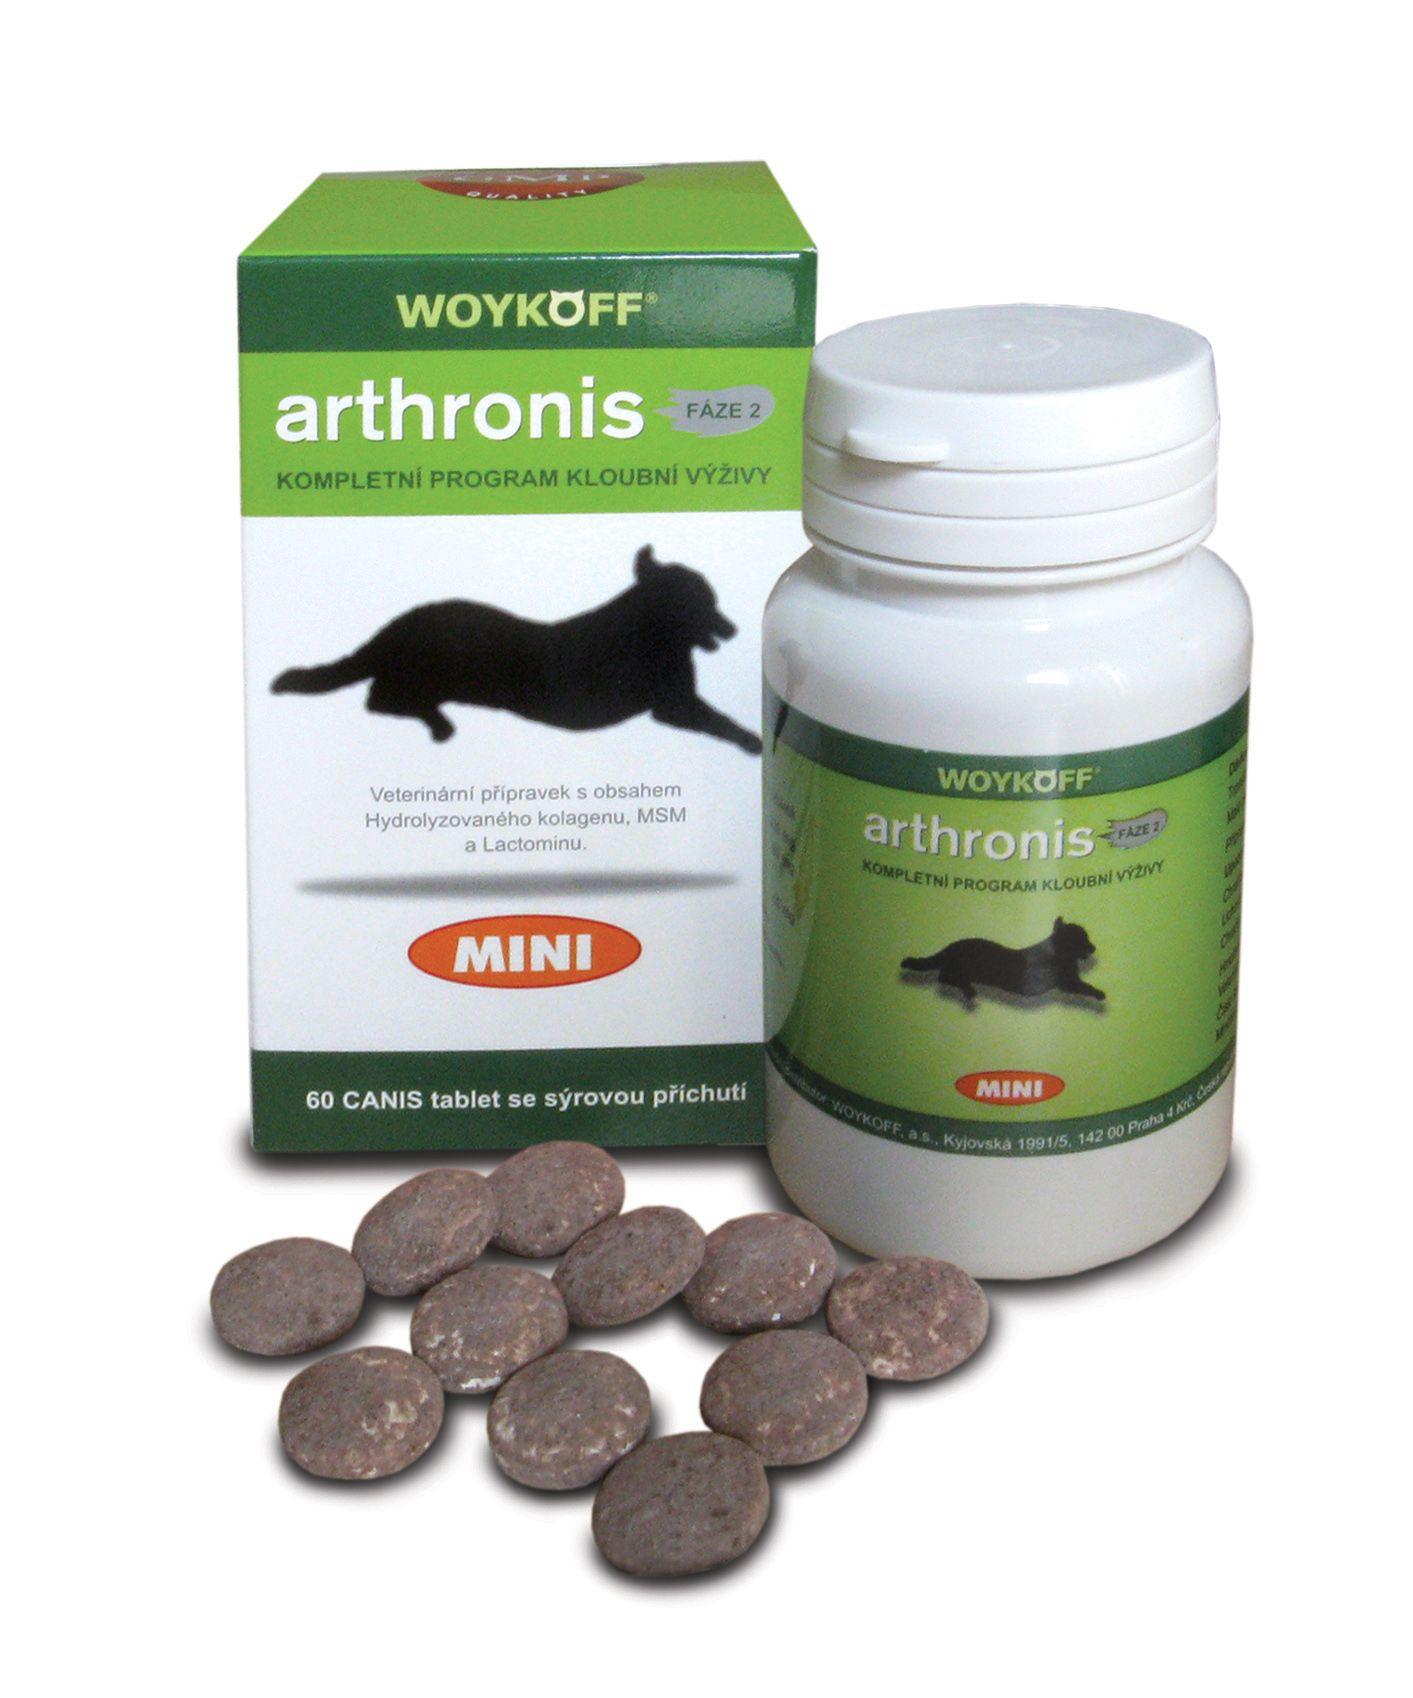 Woykoff Arthronis fáze 2 mini sýrová příchuť 60 tablet